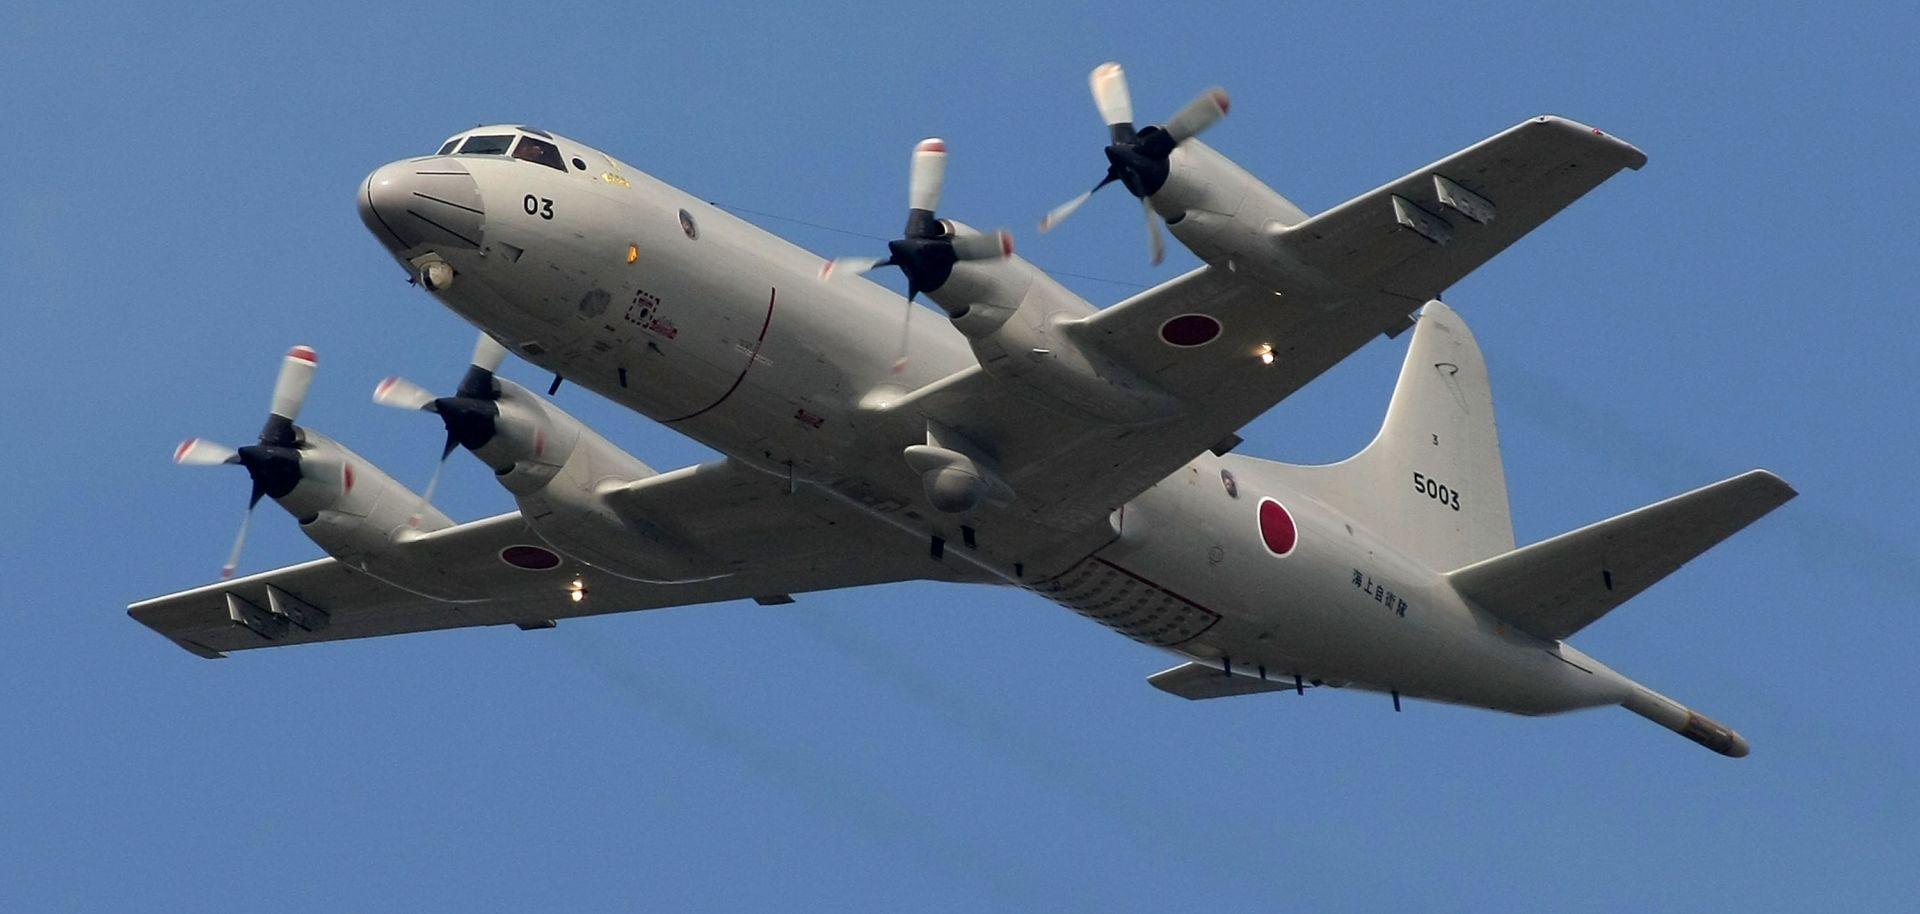 The Japanese Military's Focus on Anti-Submarine Abilities